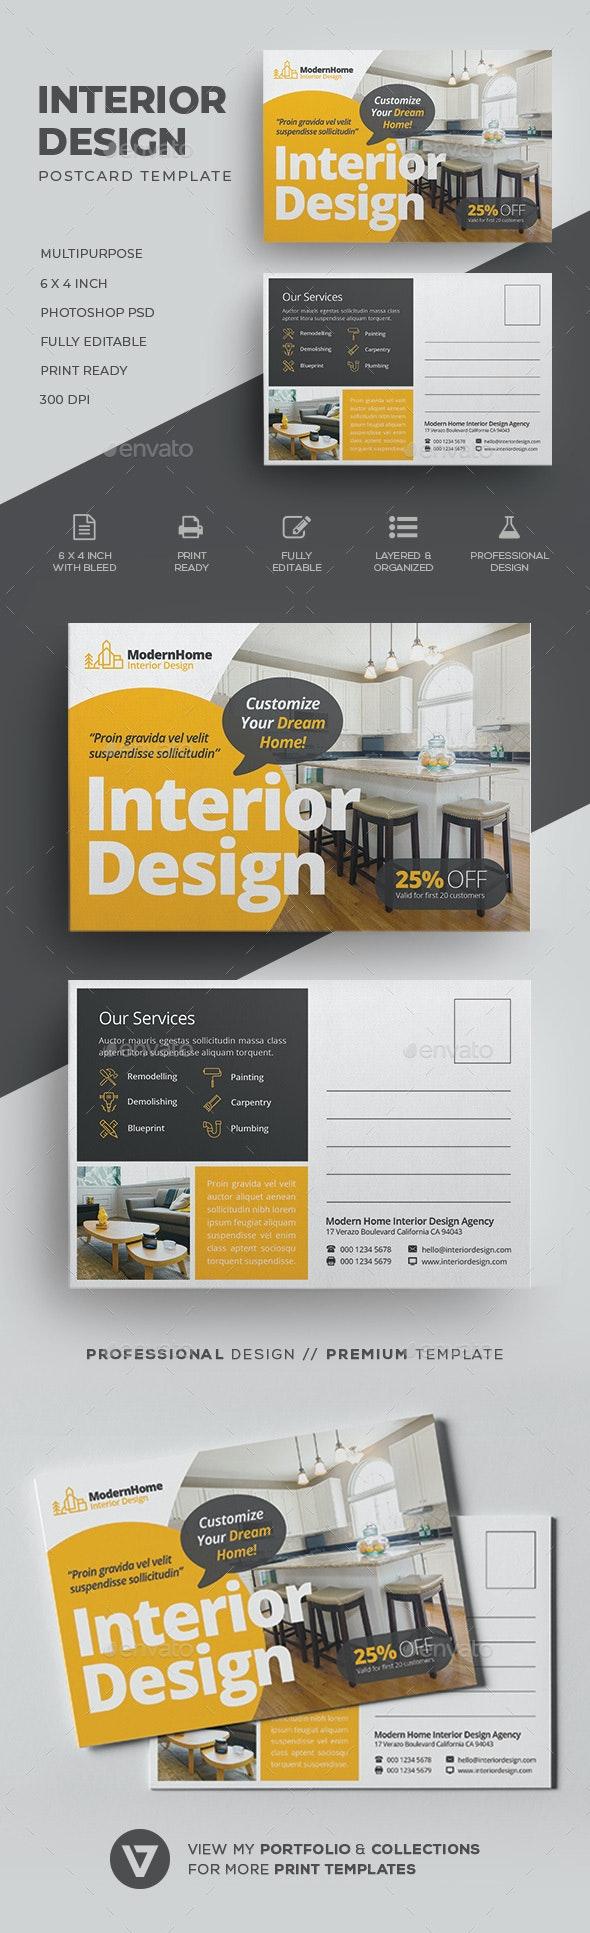 Interior Design Postcard - Cards & Invites Print Templates